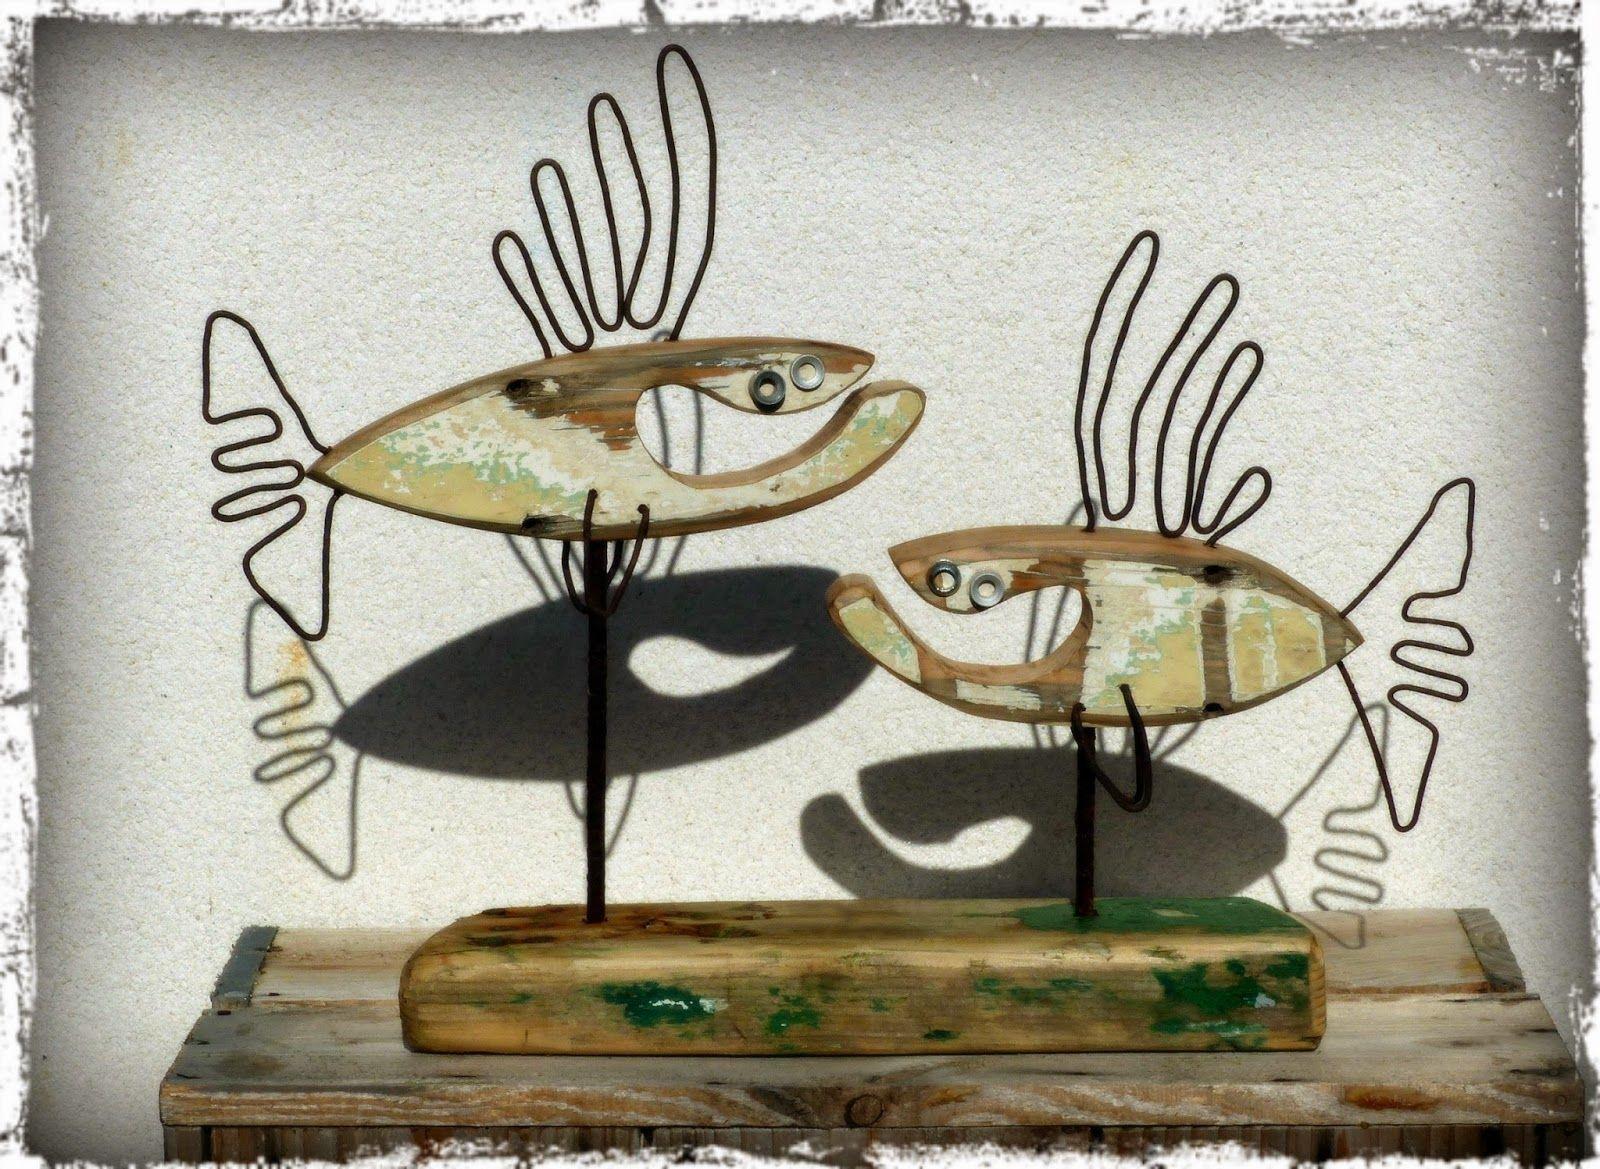 poisson bois flotté, art bois flotté   Art   Pinterest   Driftwood ...